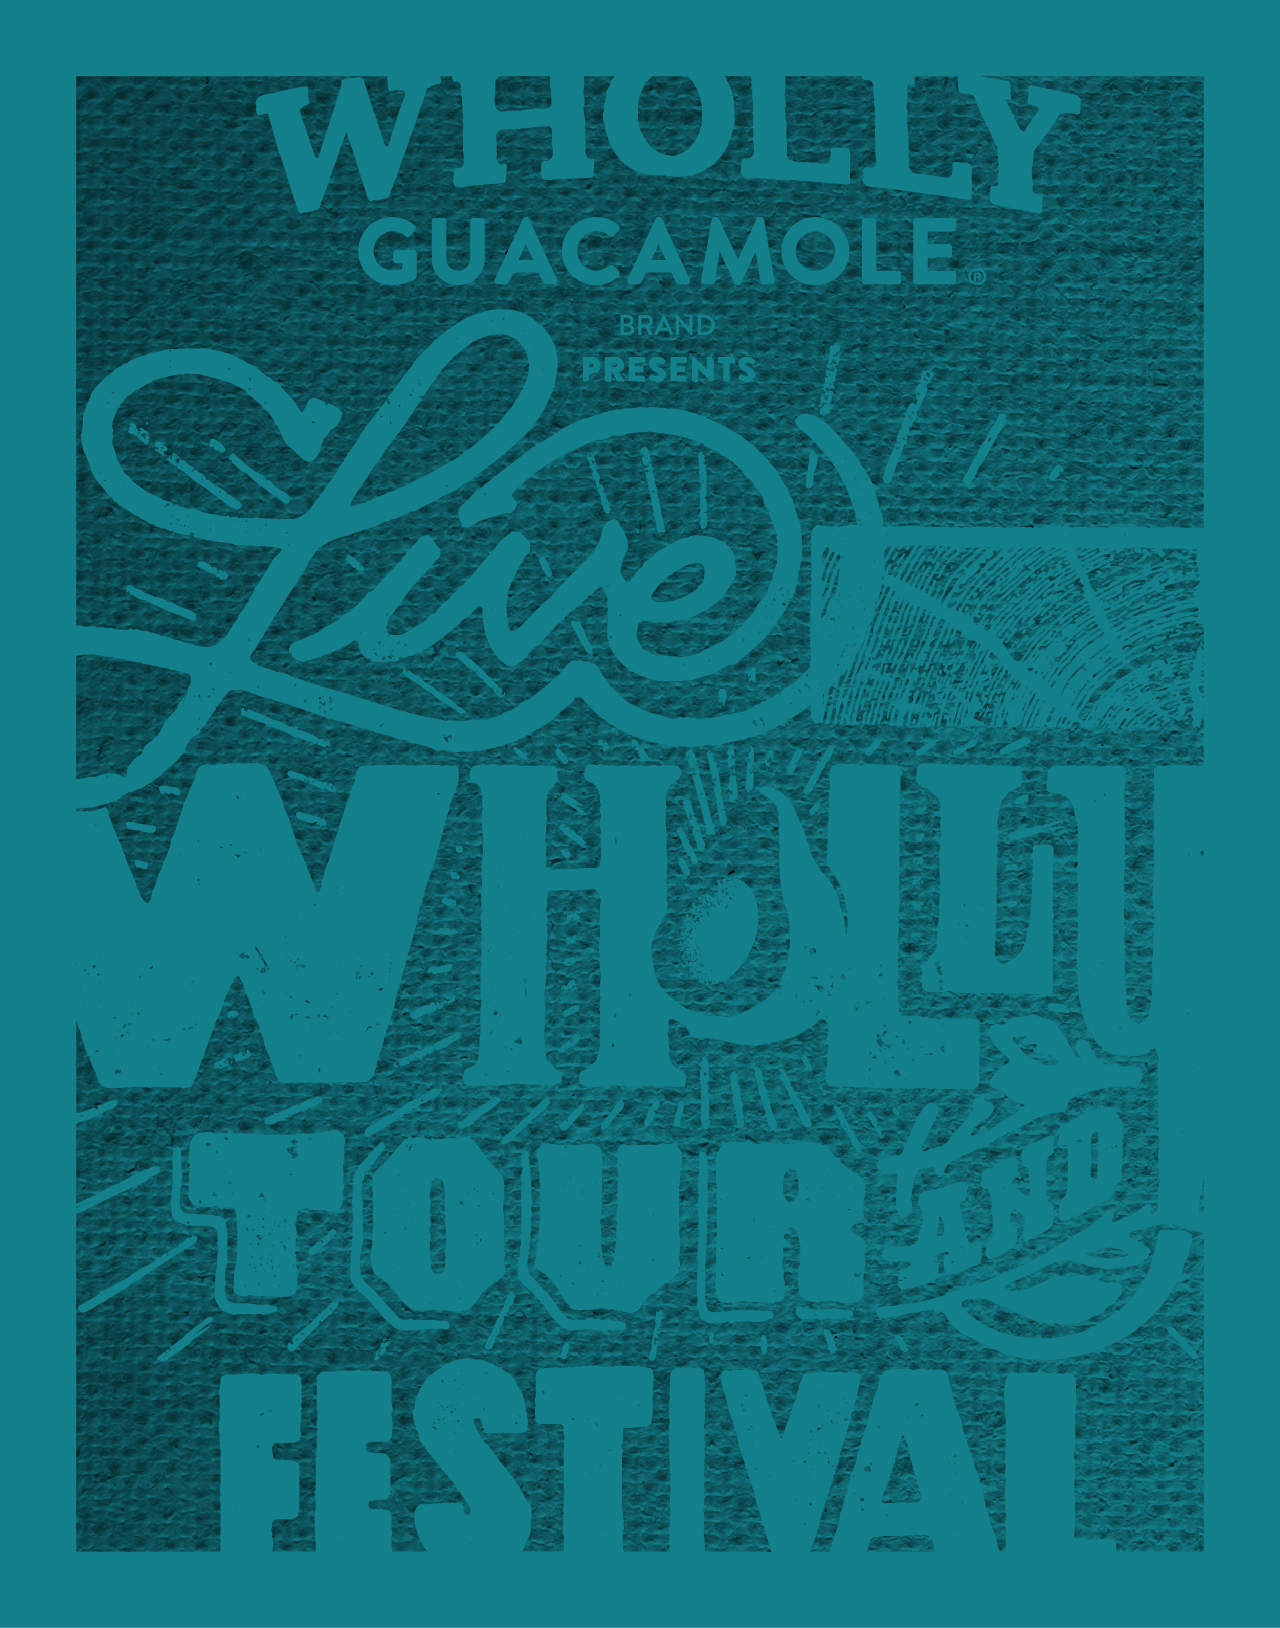 Live_Wholly_Tour_Content_Artboard 10.jpg